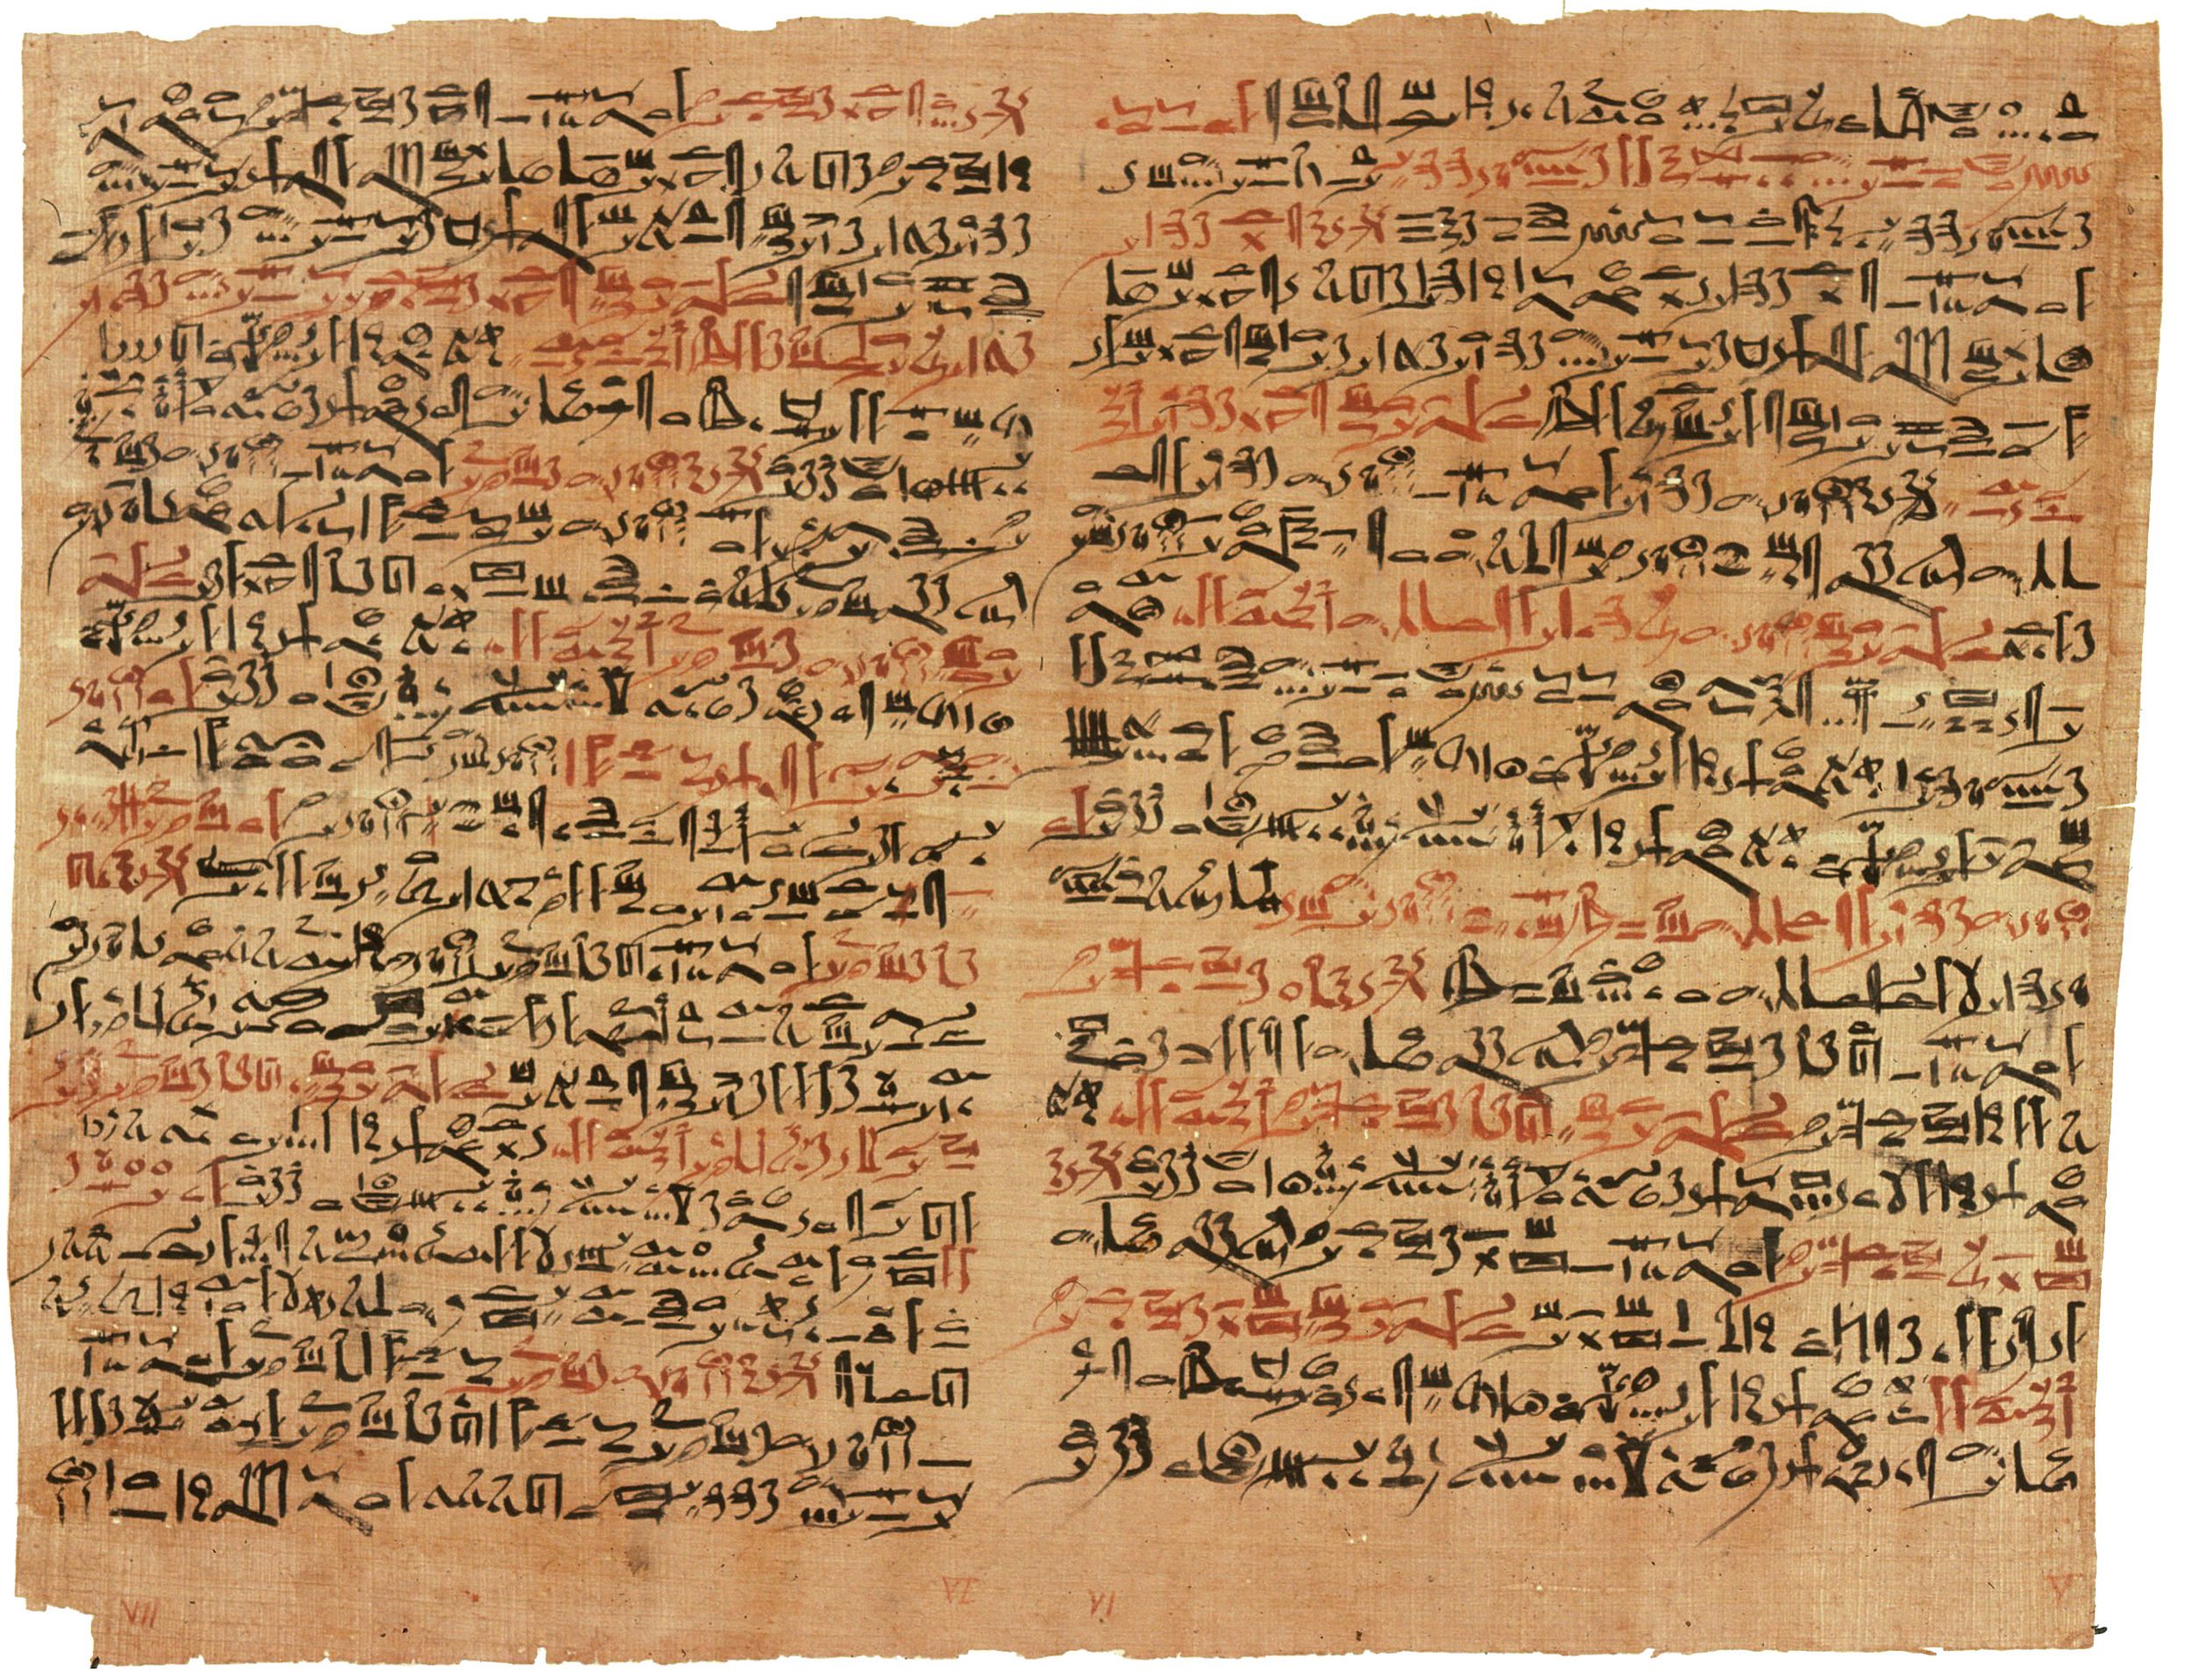 Papiro Edwin Smith, 1600 a. C.